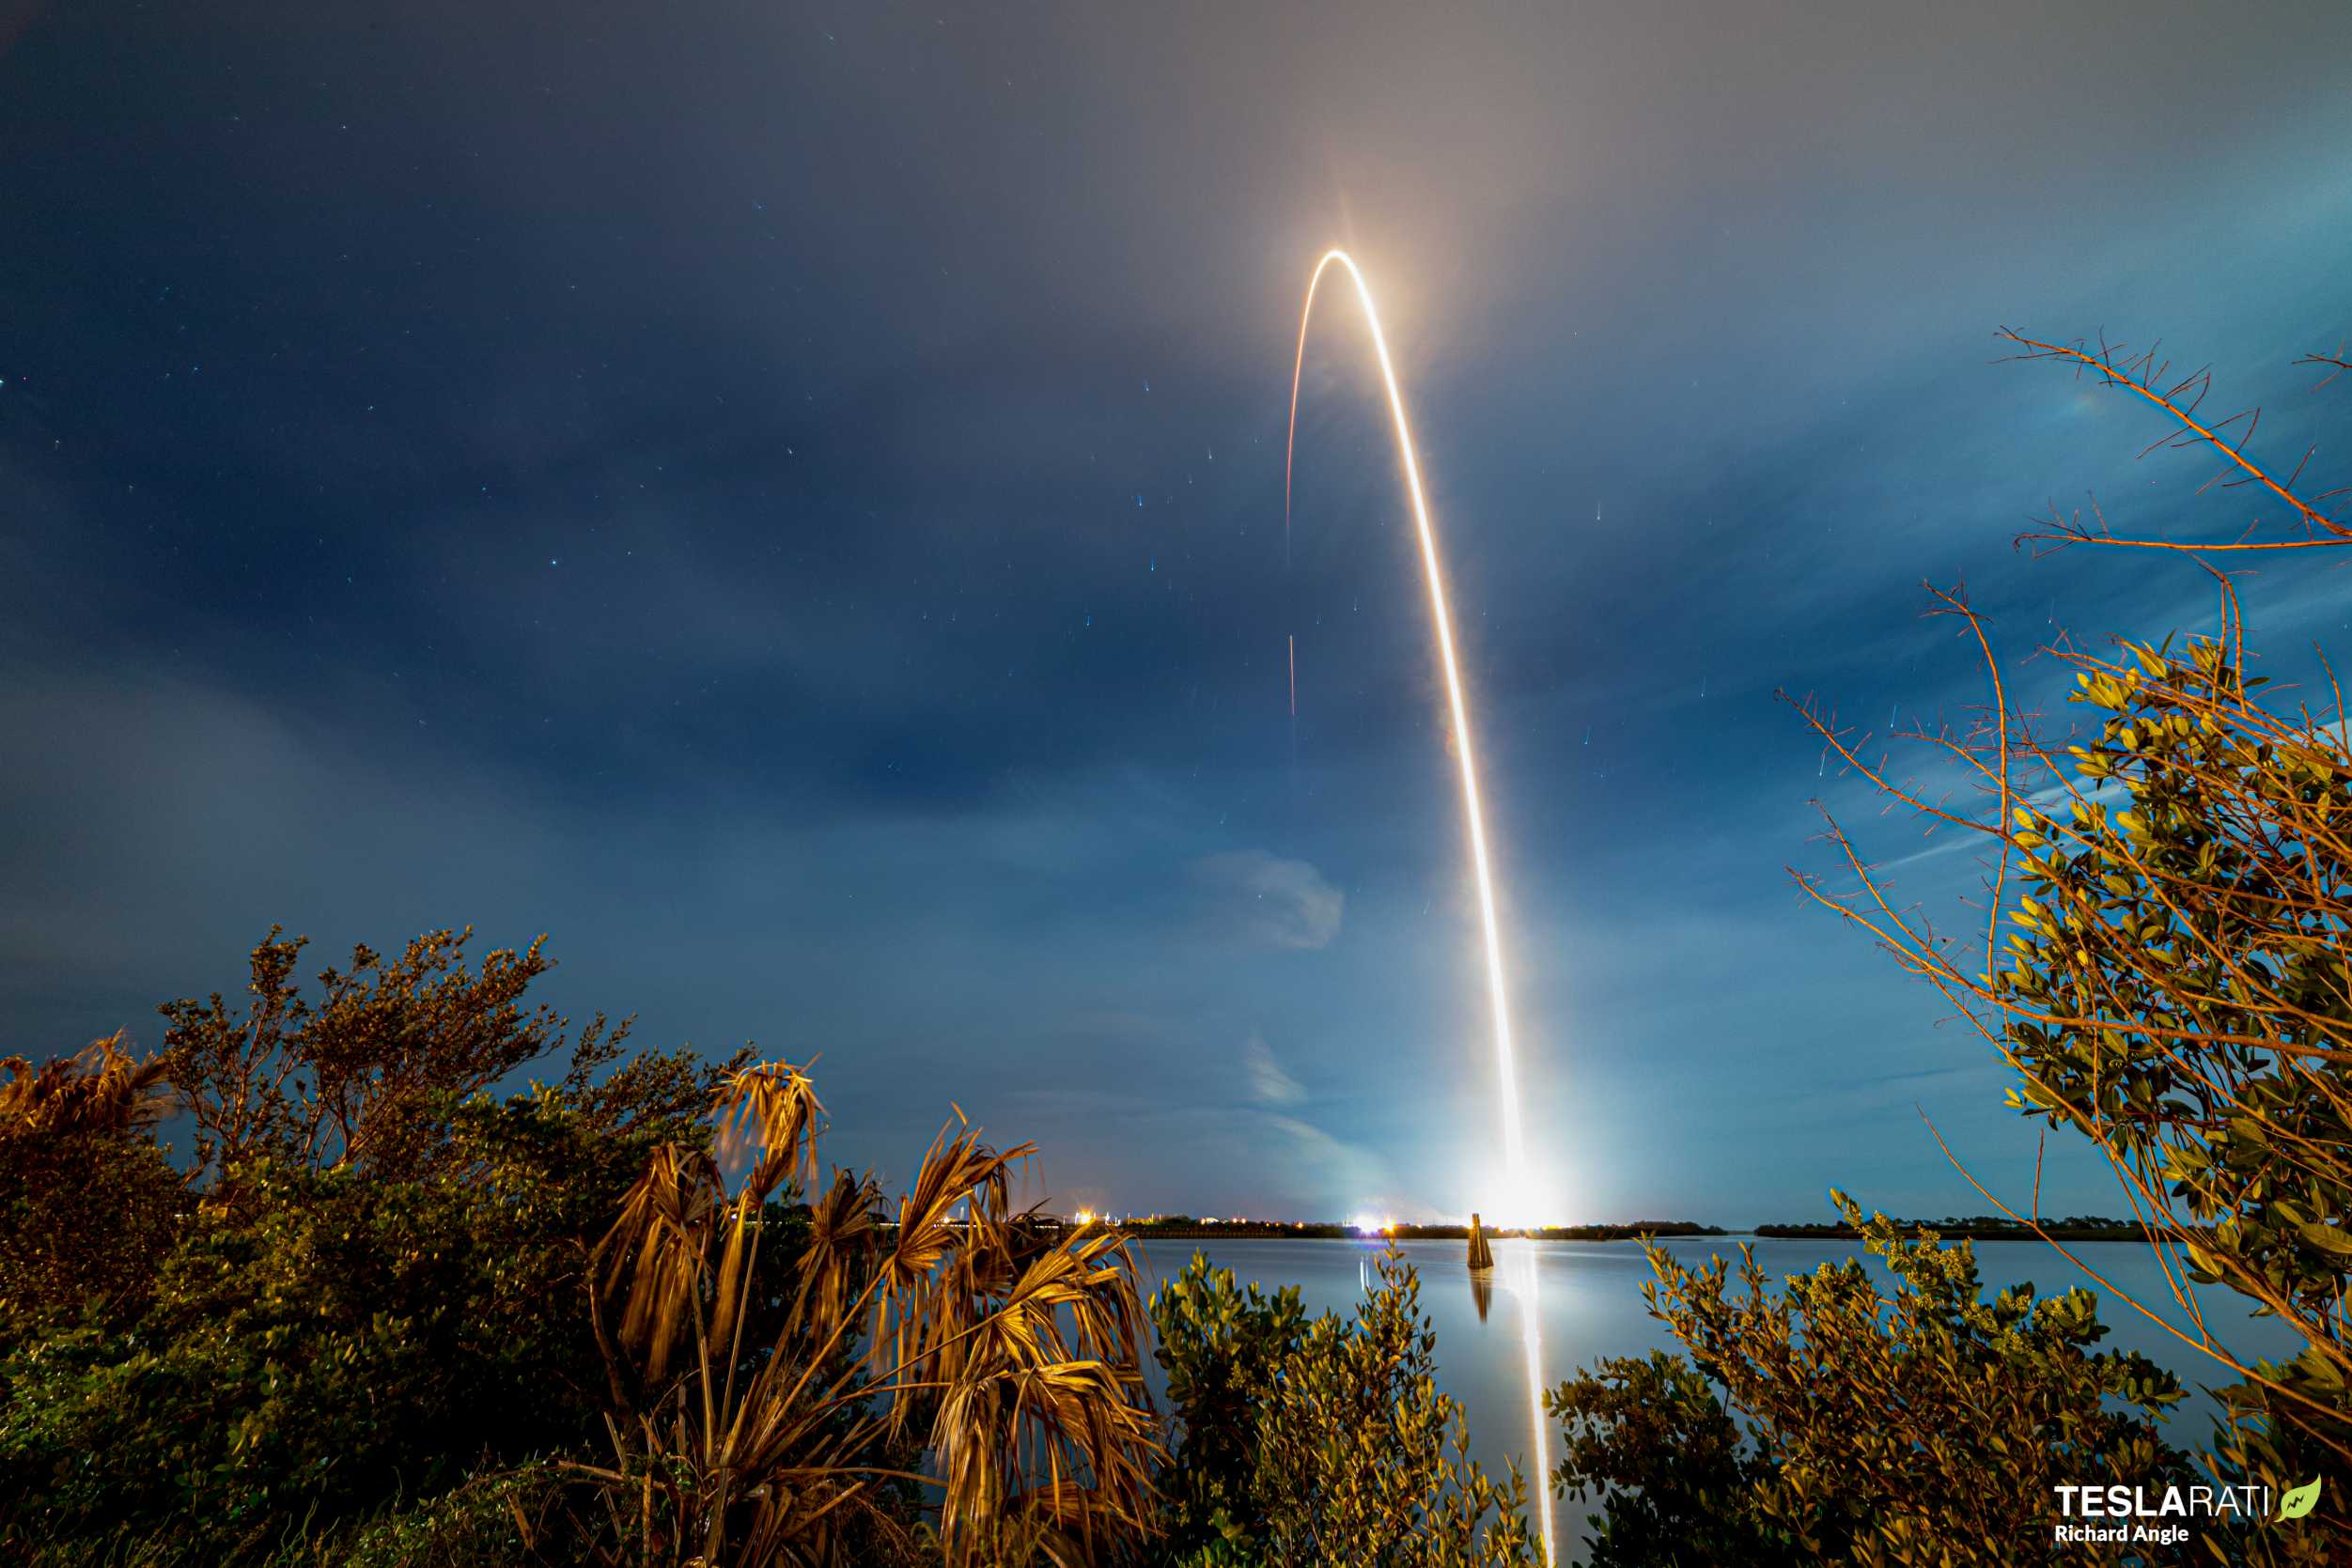 Starlink-9 BlackSky Falcon 9 B1051 080720 (Richard Angle) streak 1 (c)